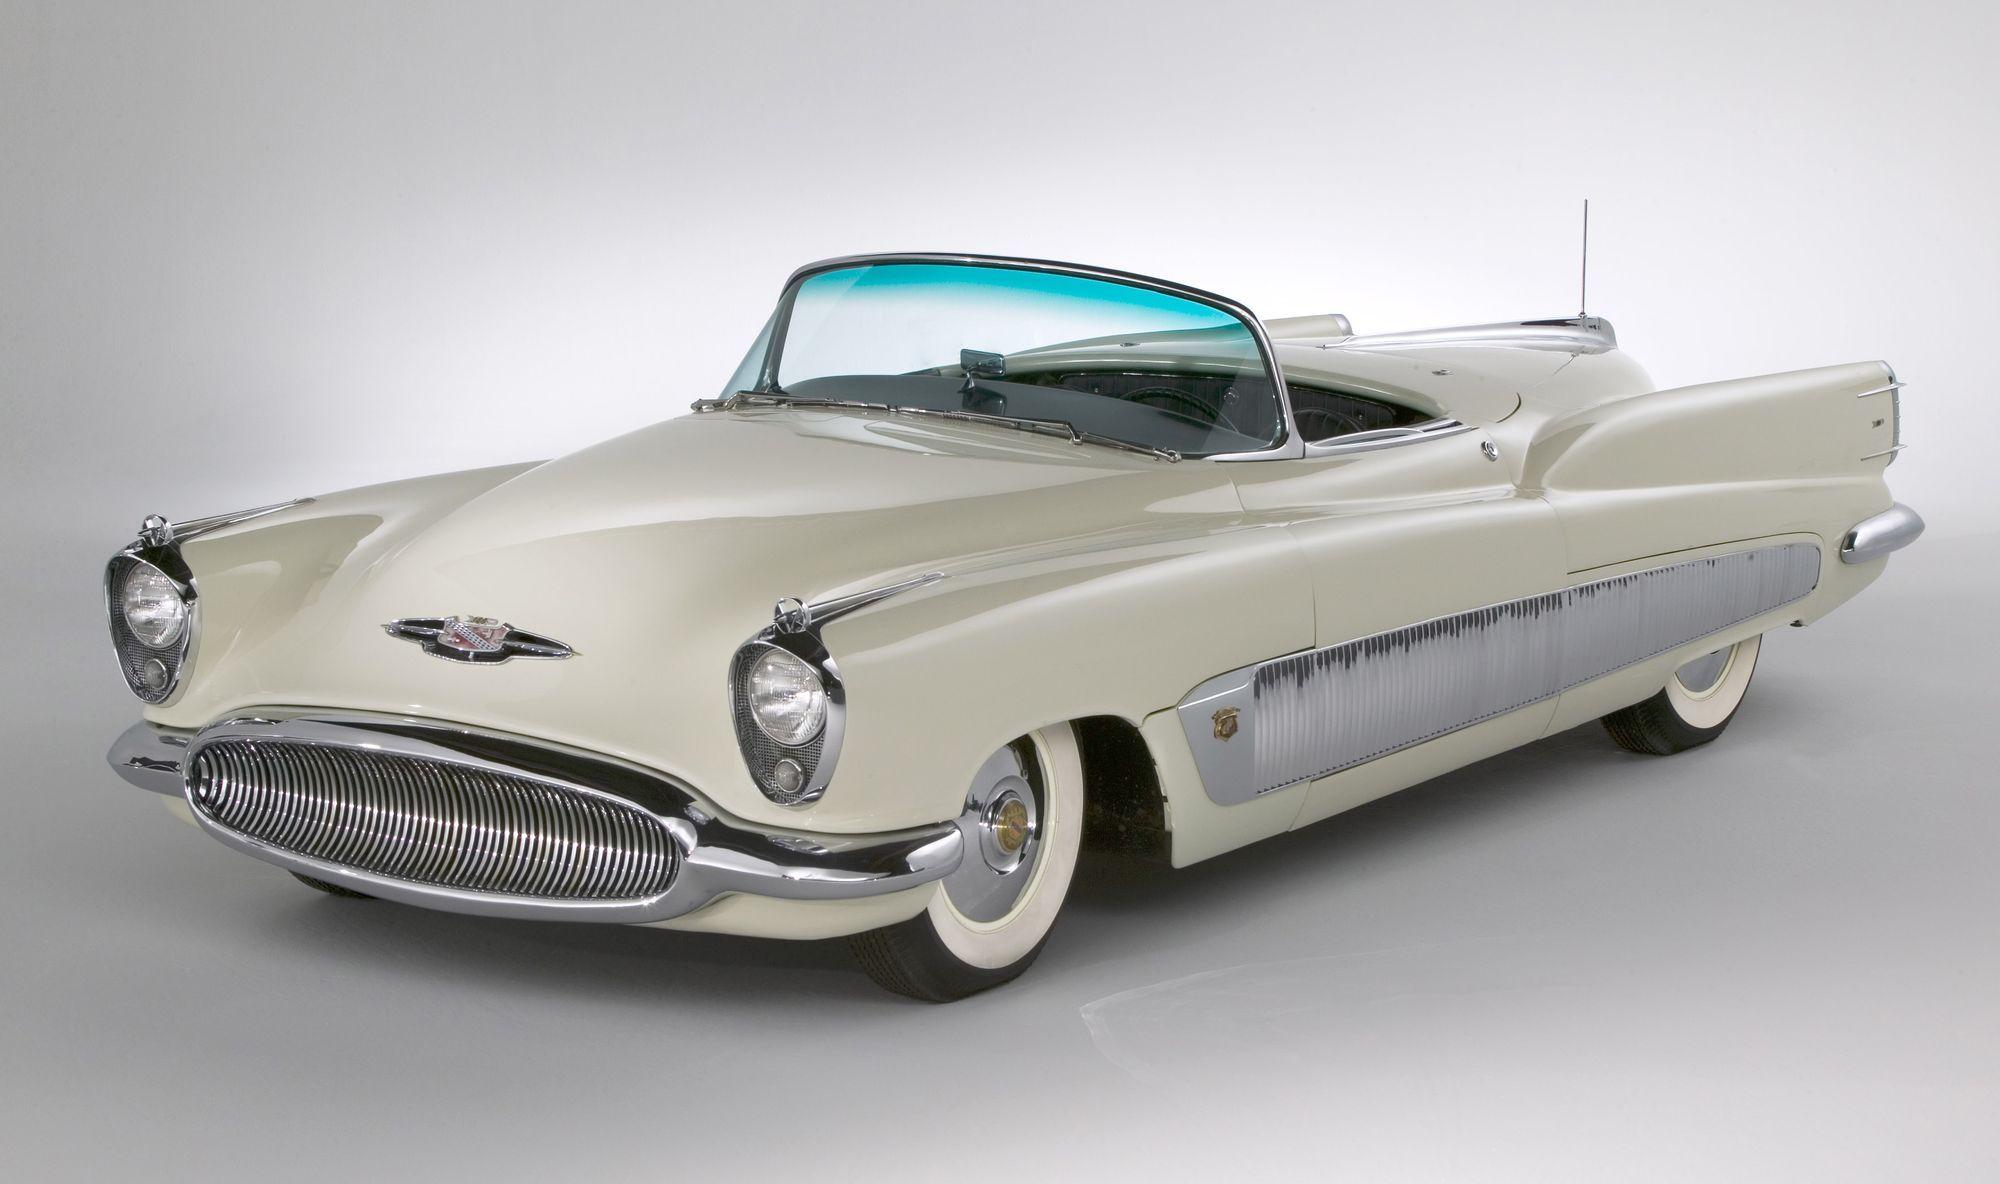 vintage car door handle. Buick Narrows Down Its Top Concept Cars | Hemmings Daily Y Job Vintage Car Door Handle D